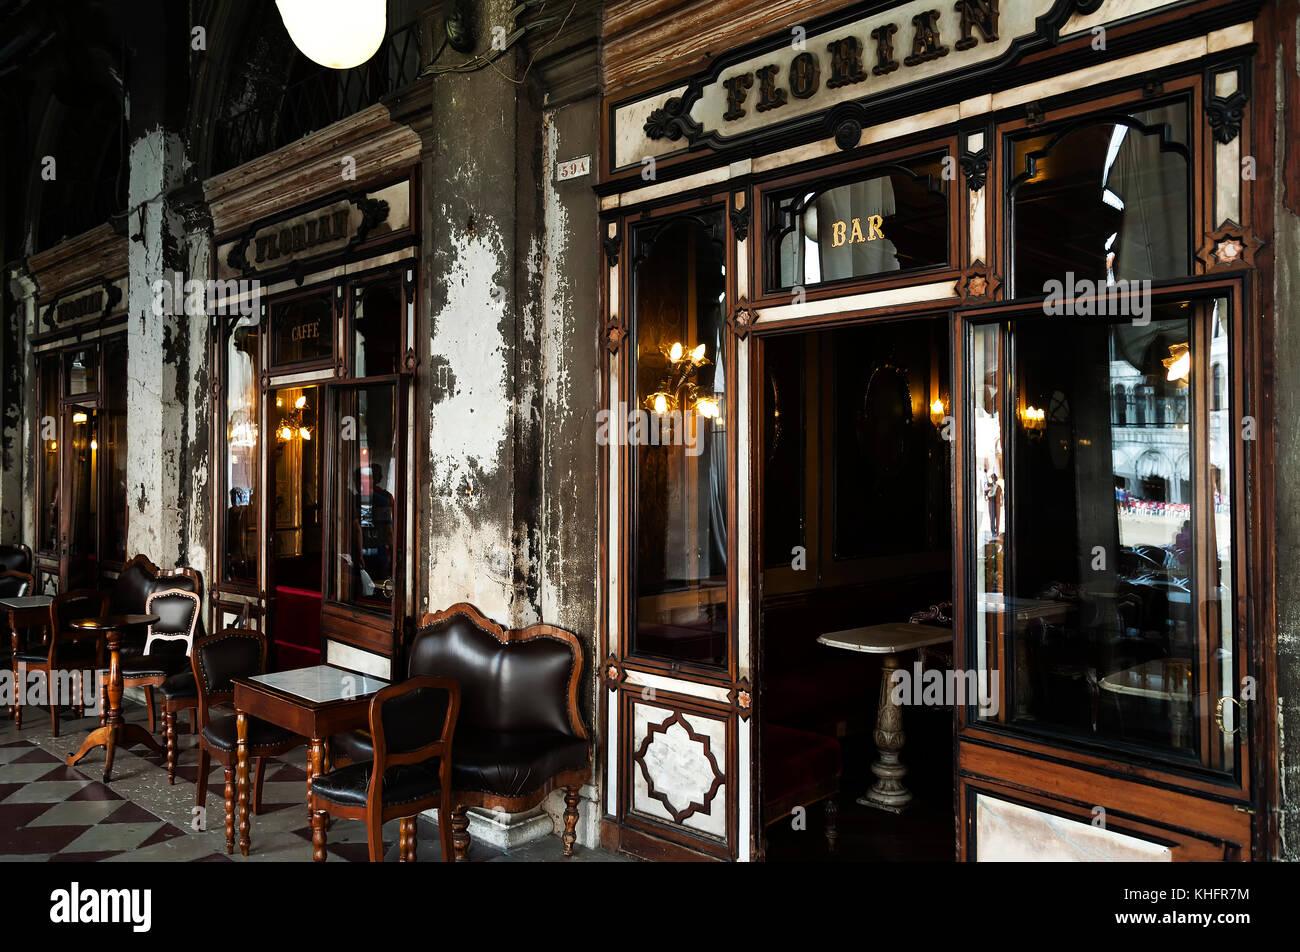 Cafe Florian Venice Italy Menu